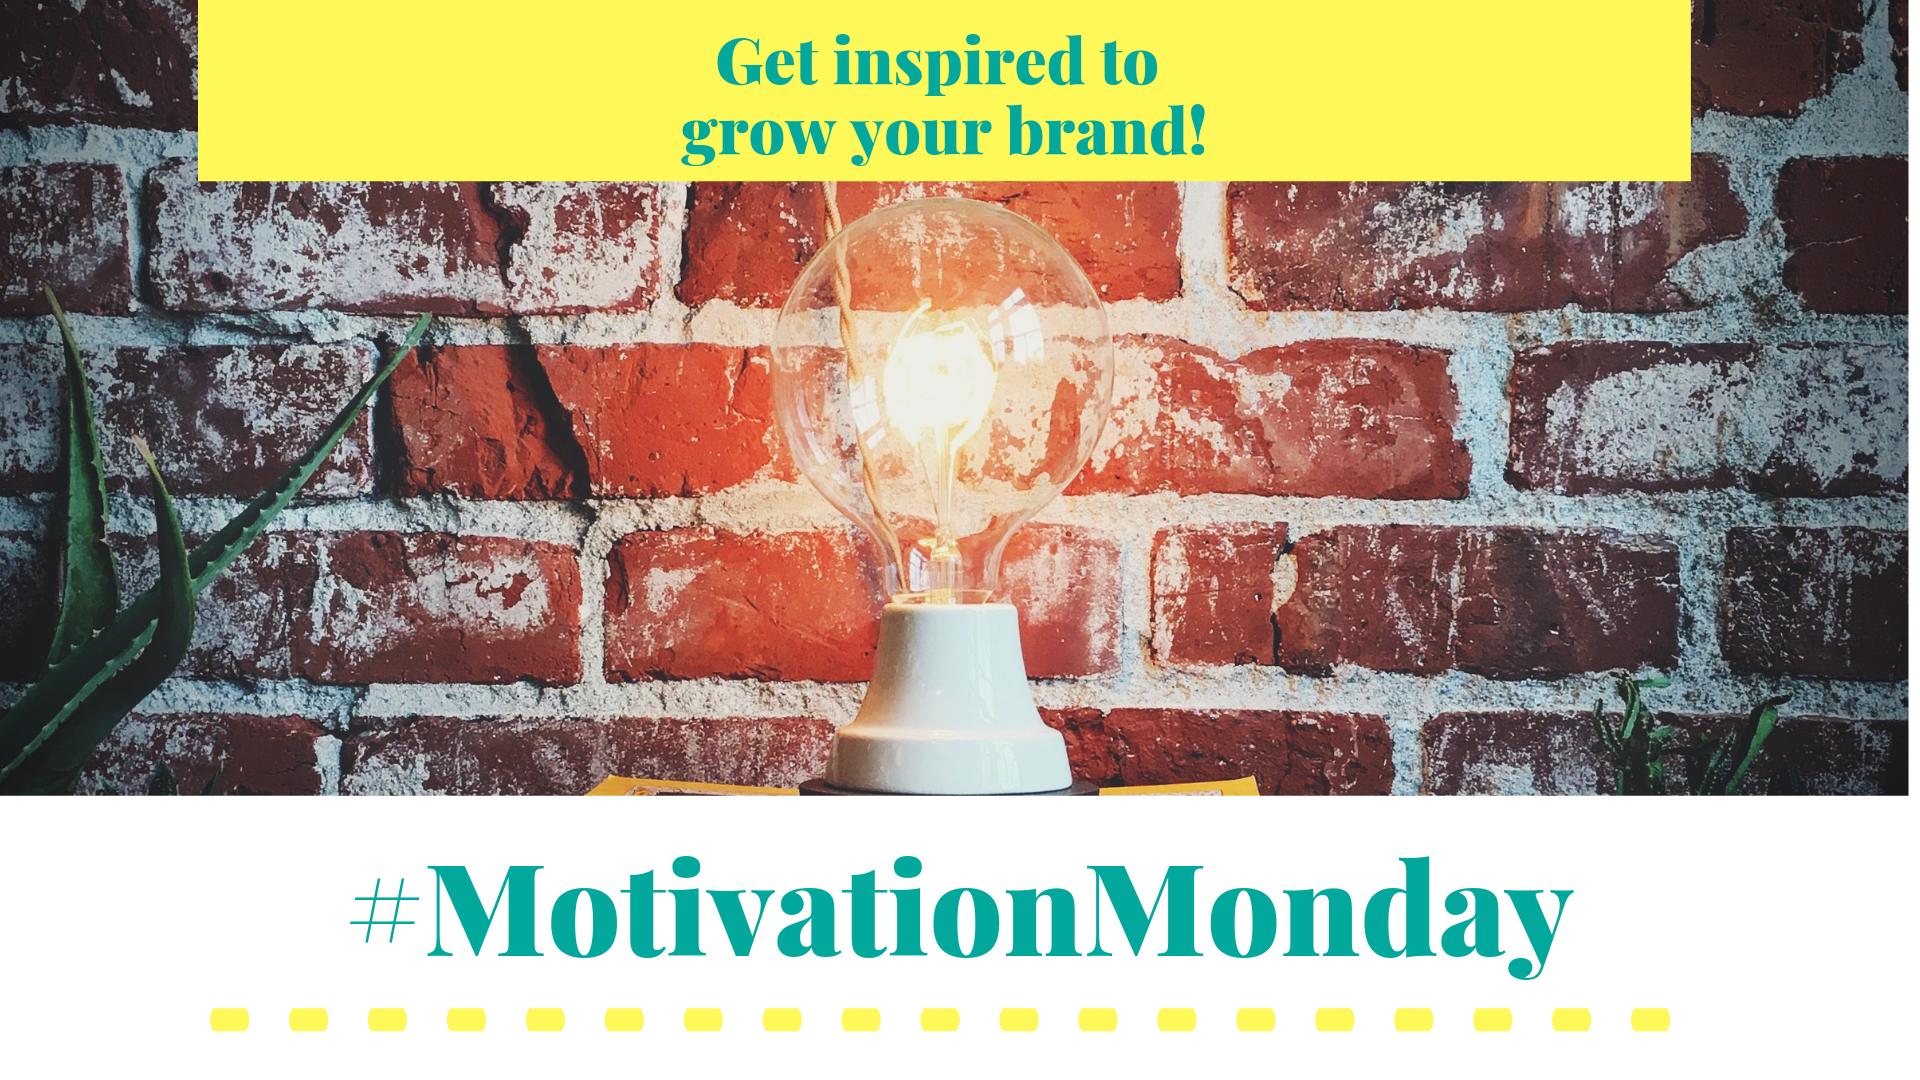 #MotivationMonday (1)